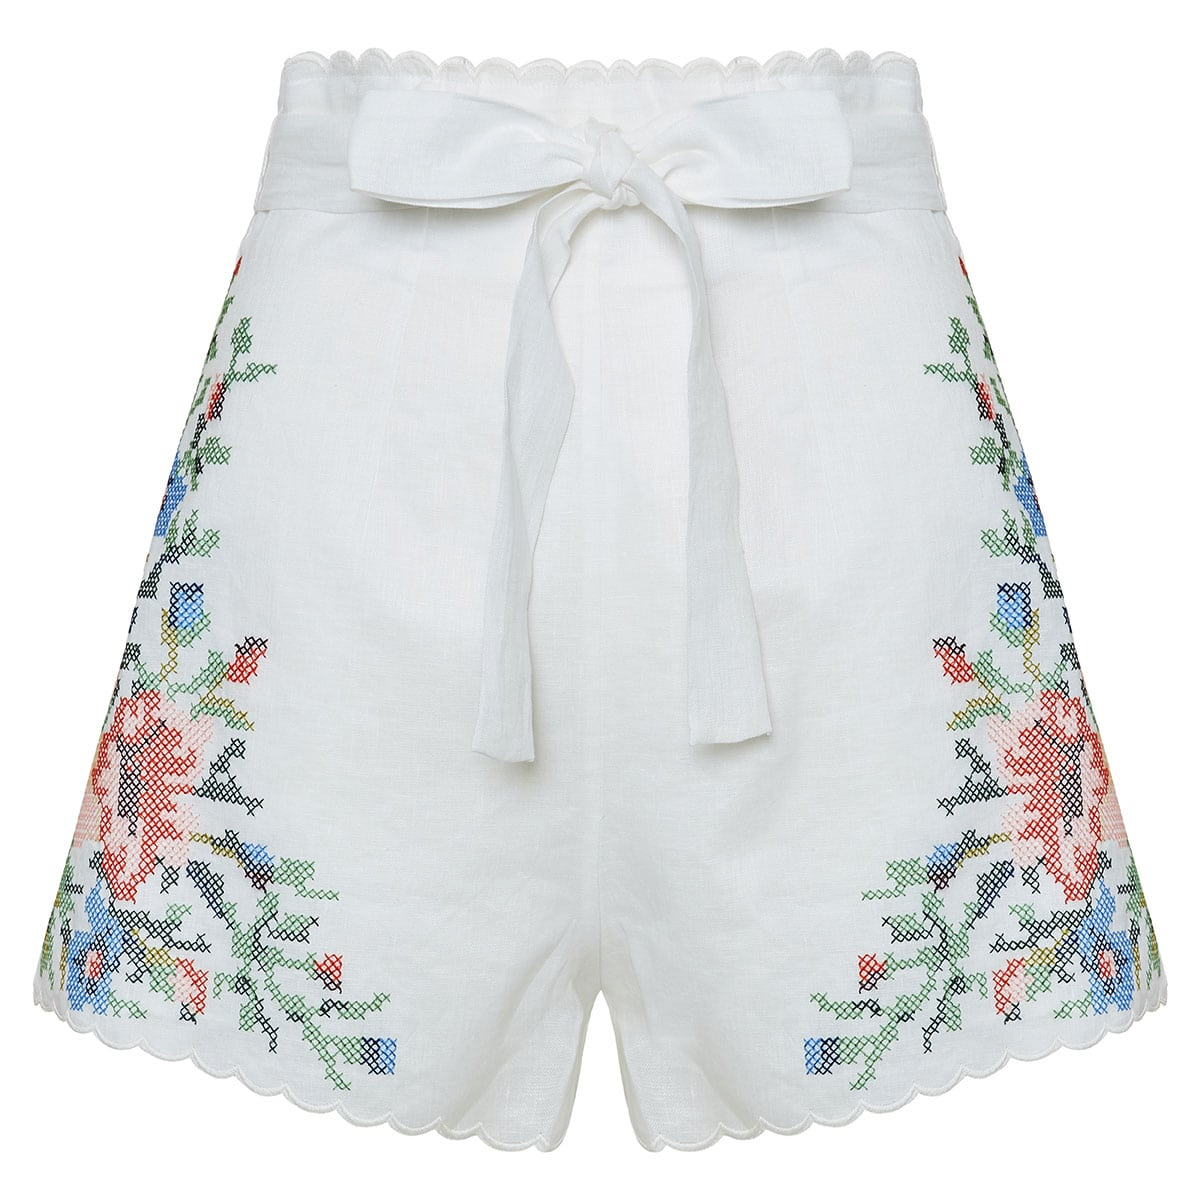 Juliette floral-embroidered linen shorts